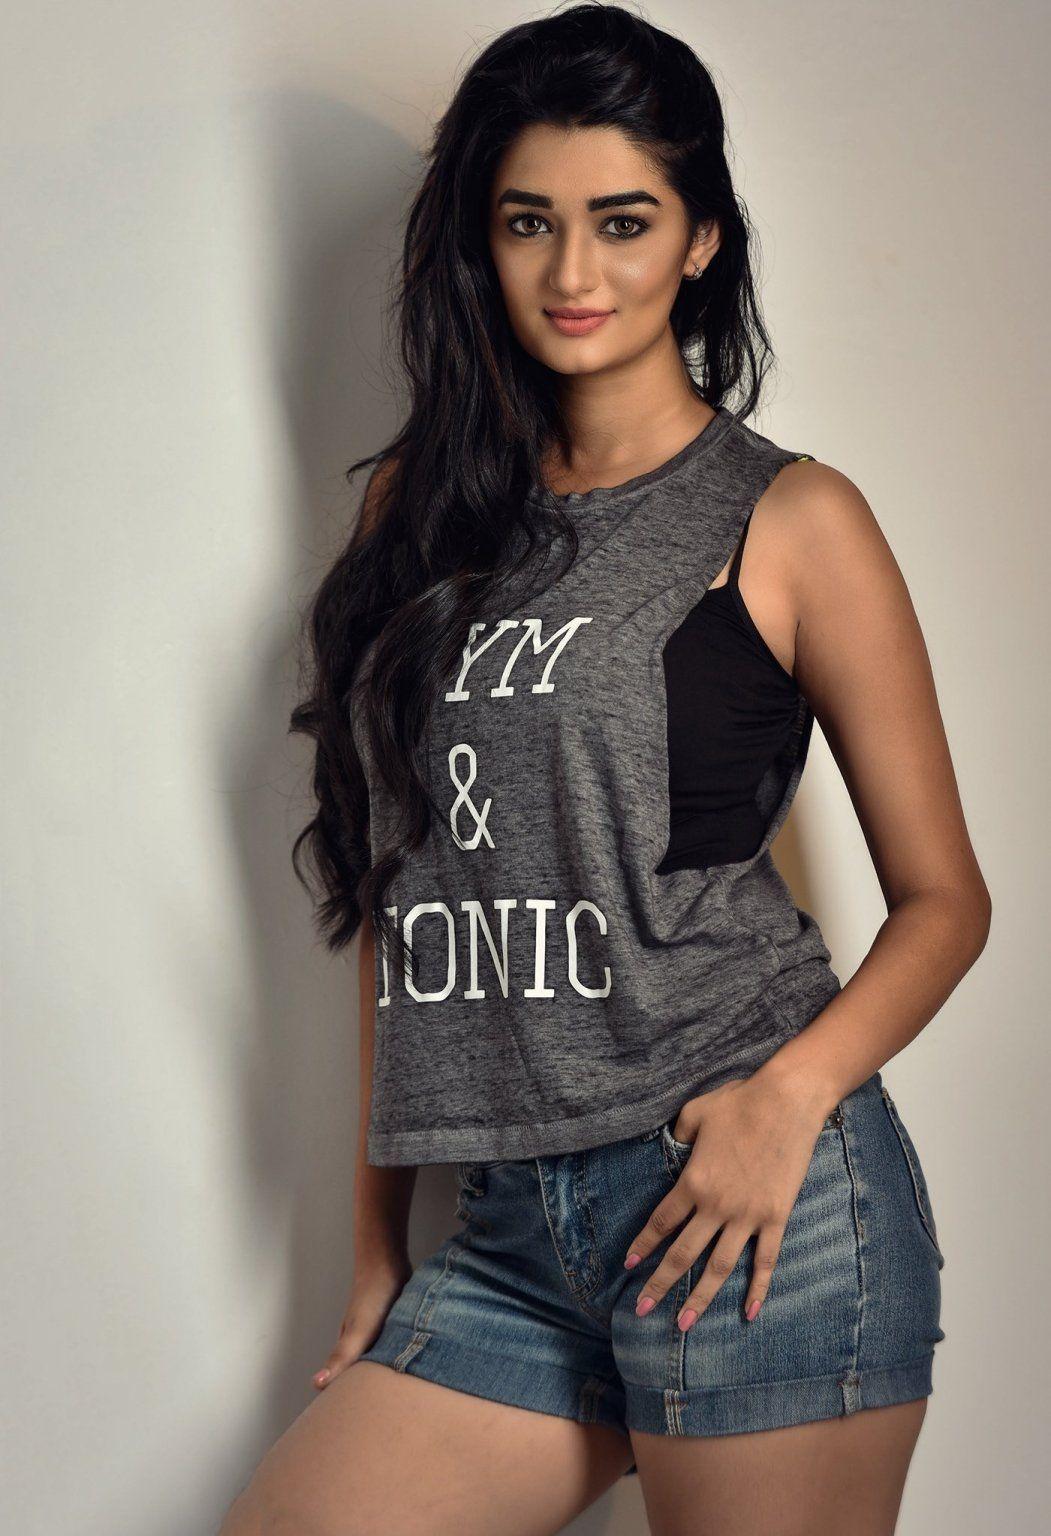 Indian Models Female